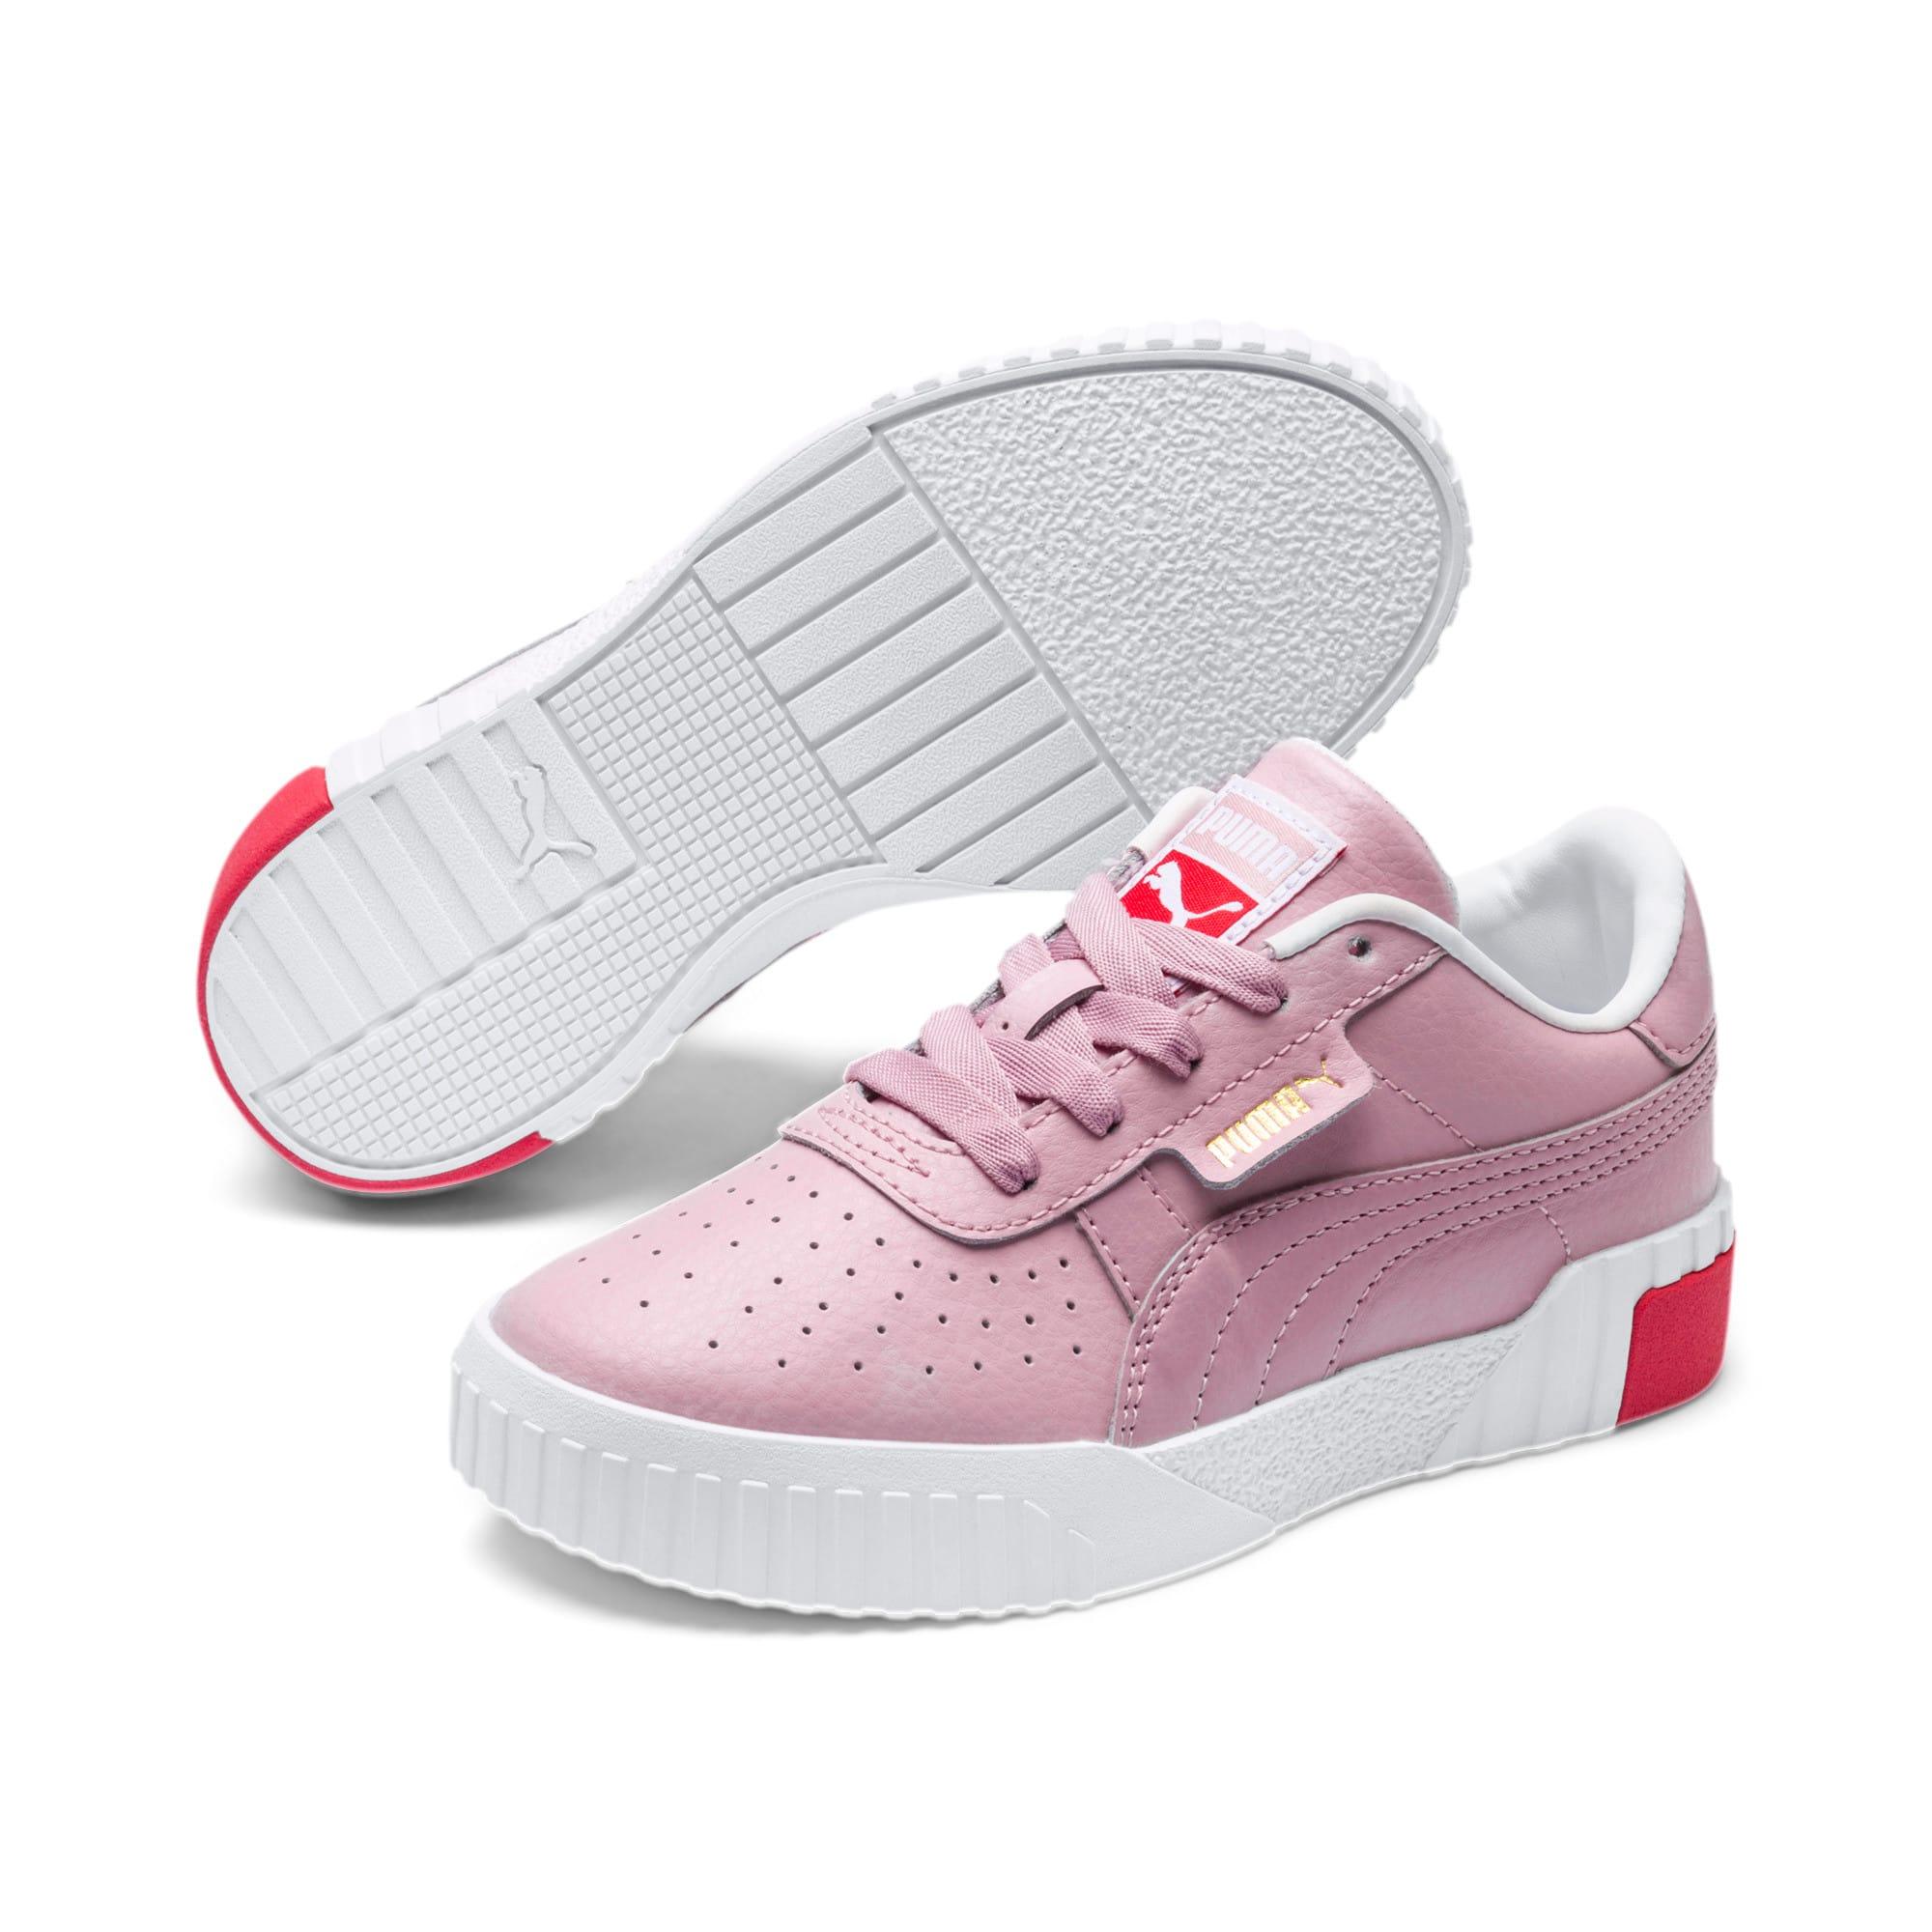 Thumbnail 2 of Cali Little Kids' Shoes, Puma White-Hibiscus, medium